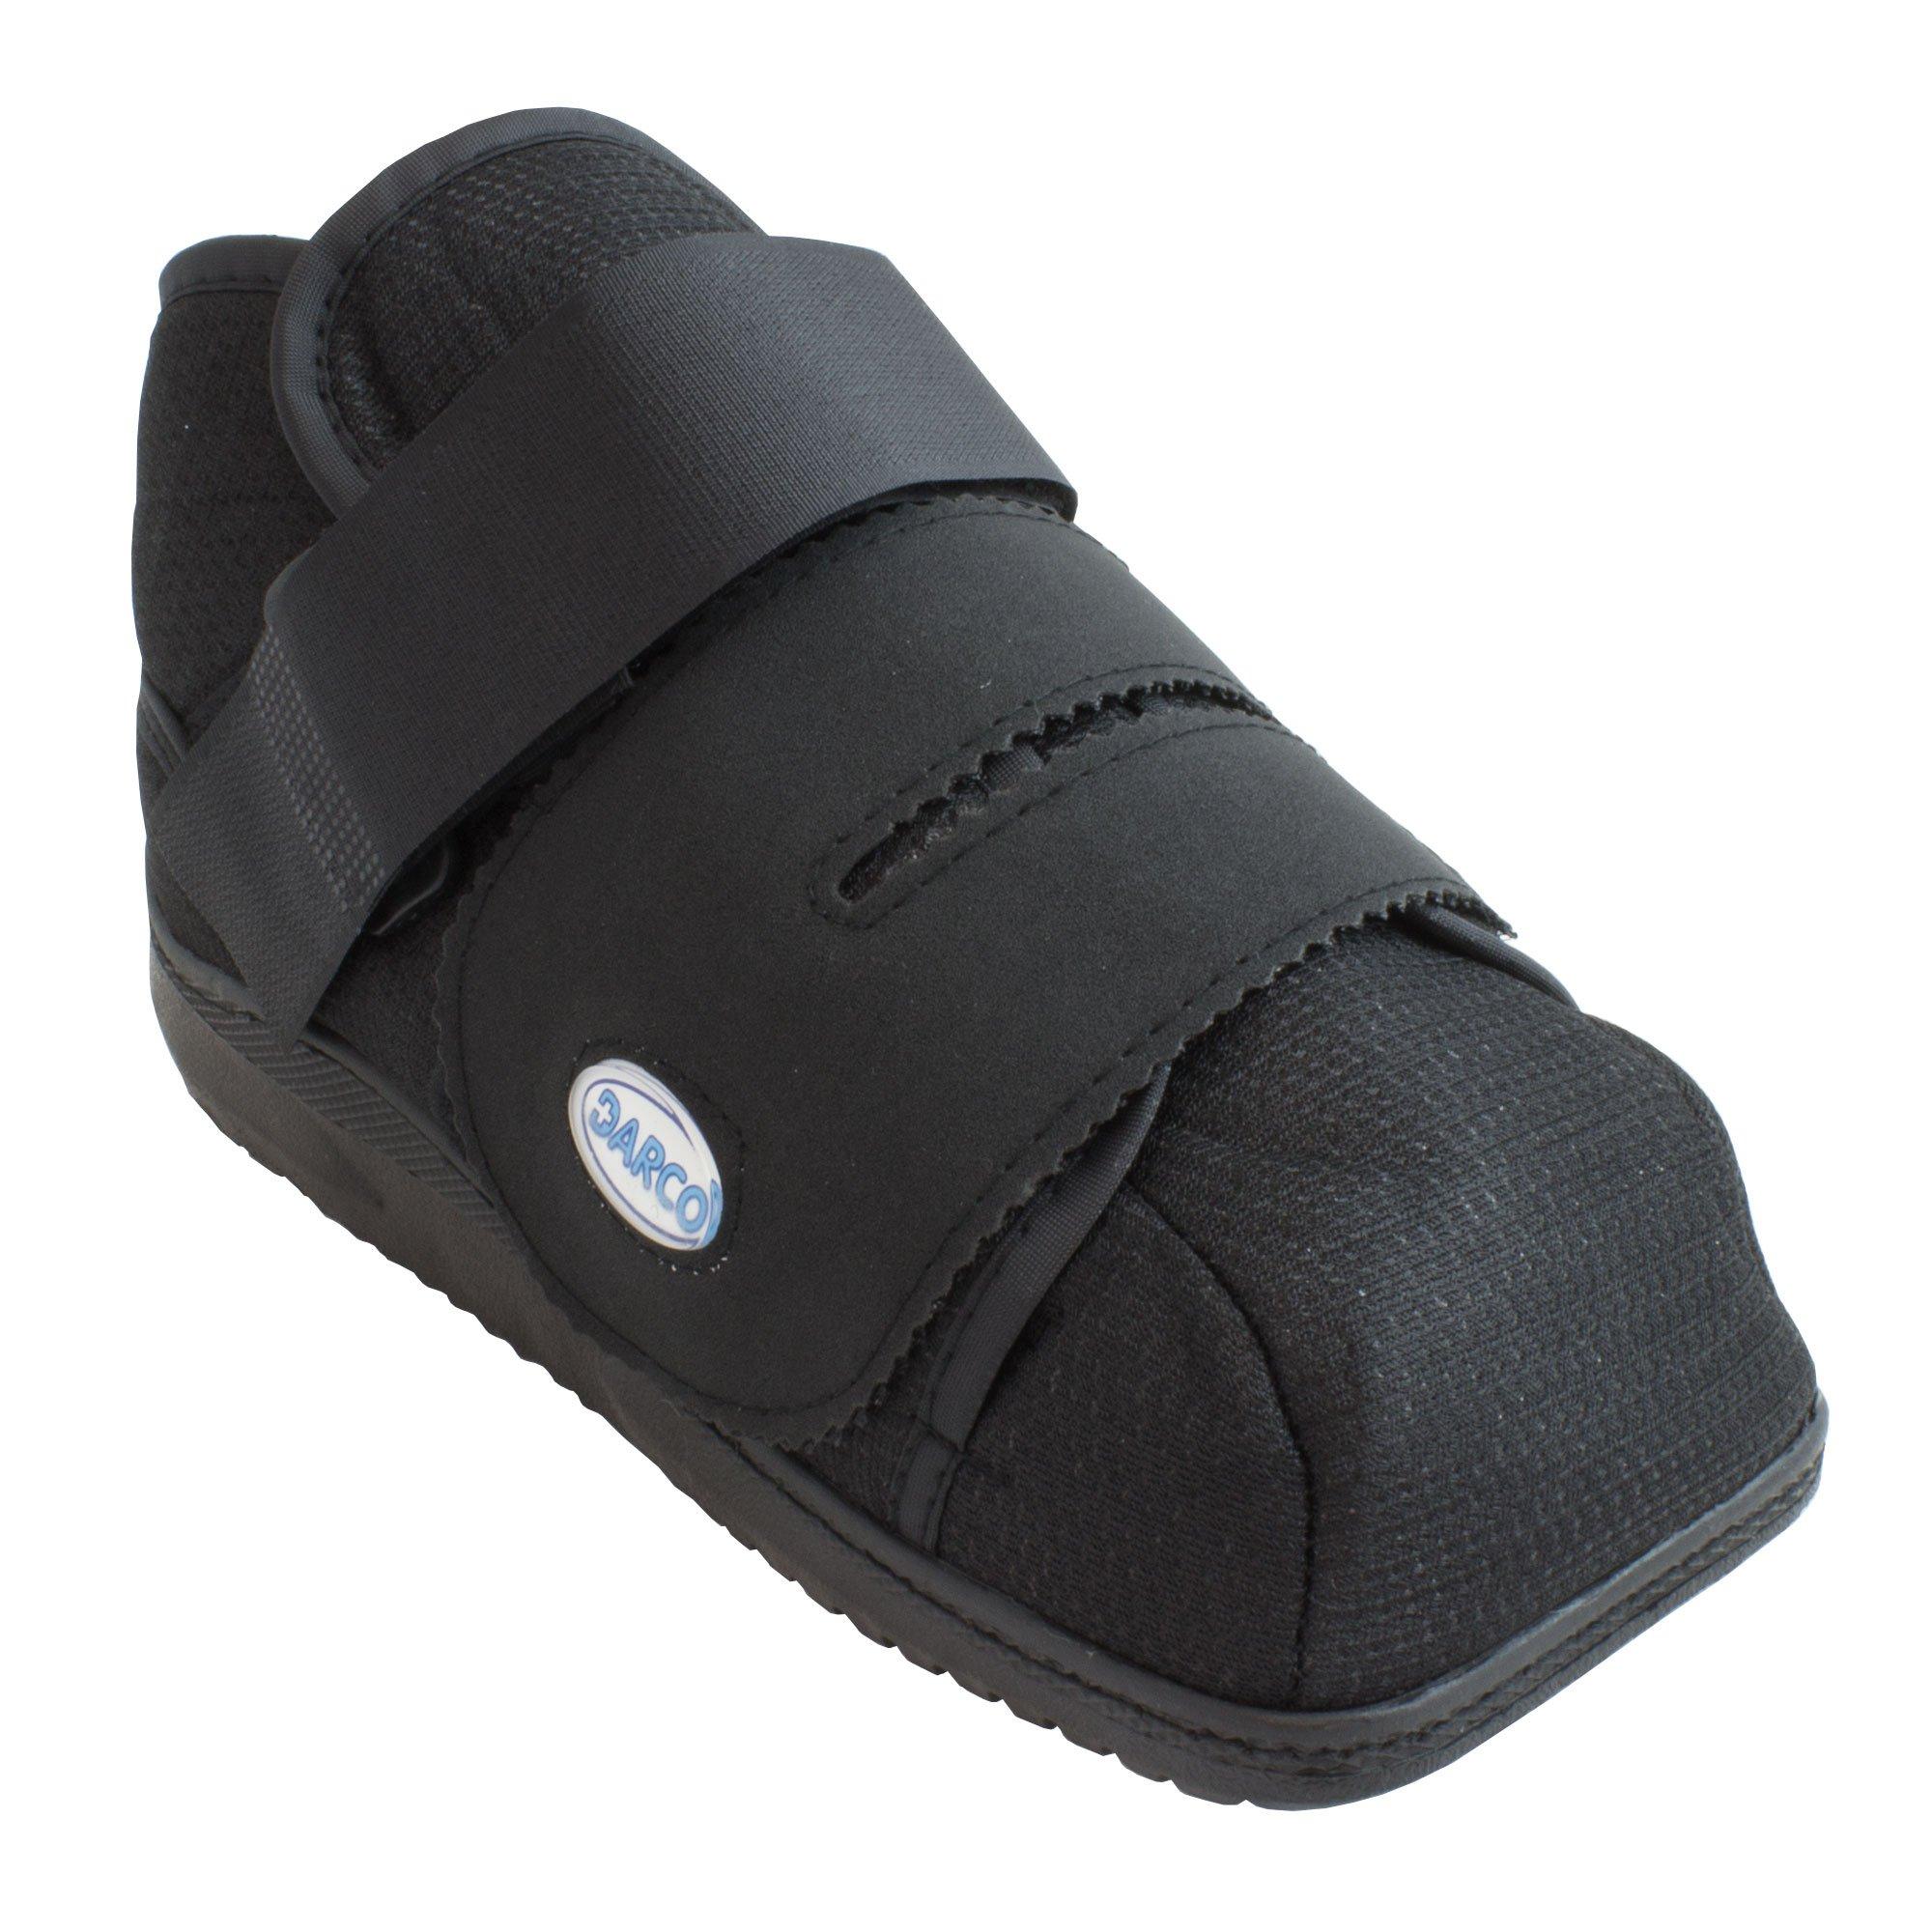 Darco APB Hi Boot Post-Op Shoe 919 (Medium) by Freeman